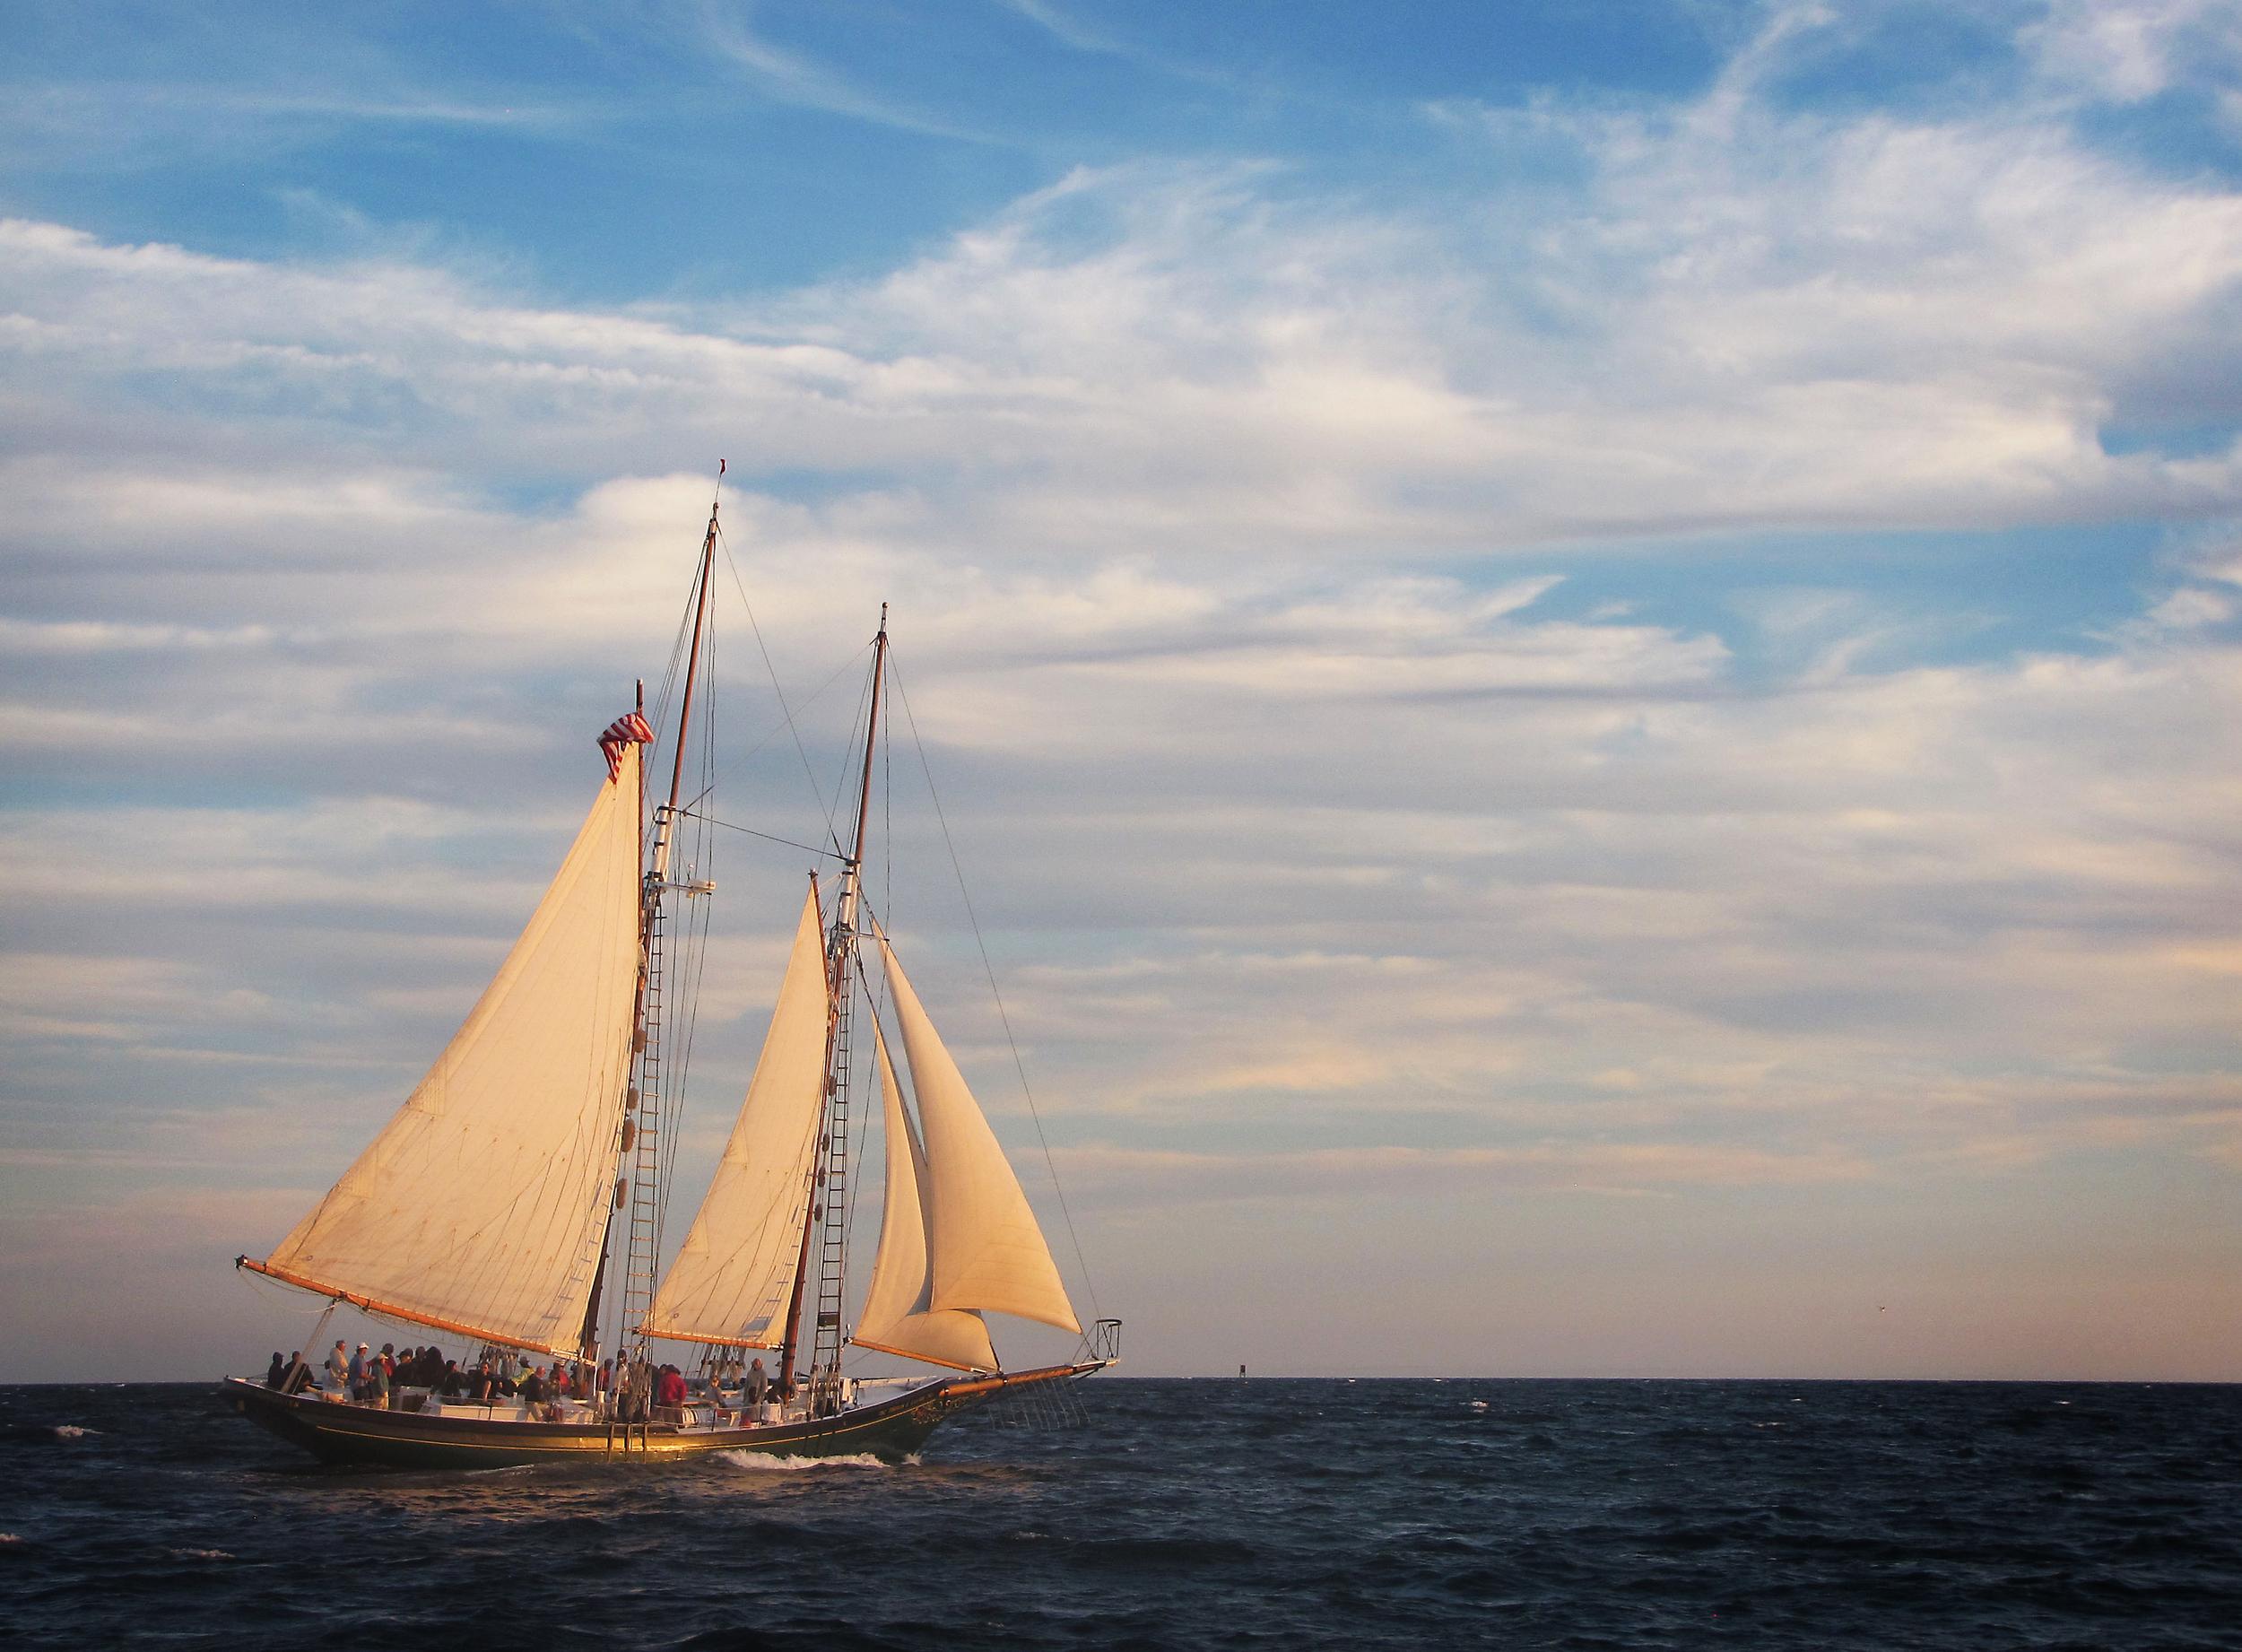 Schooner Thomas Lannon - Gloucester Harbor